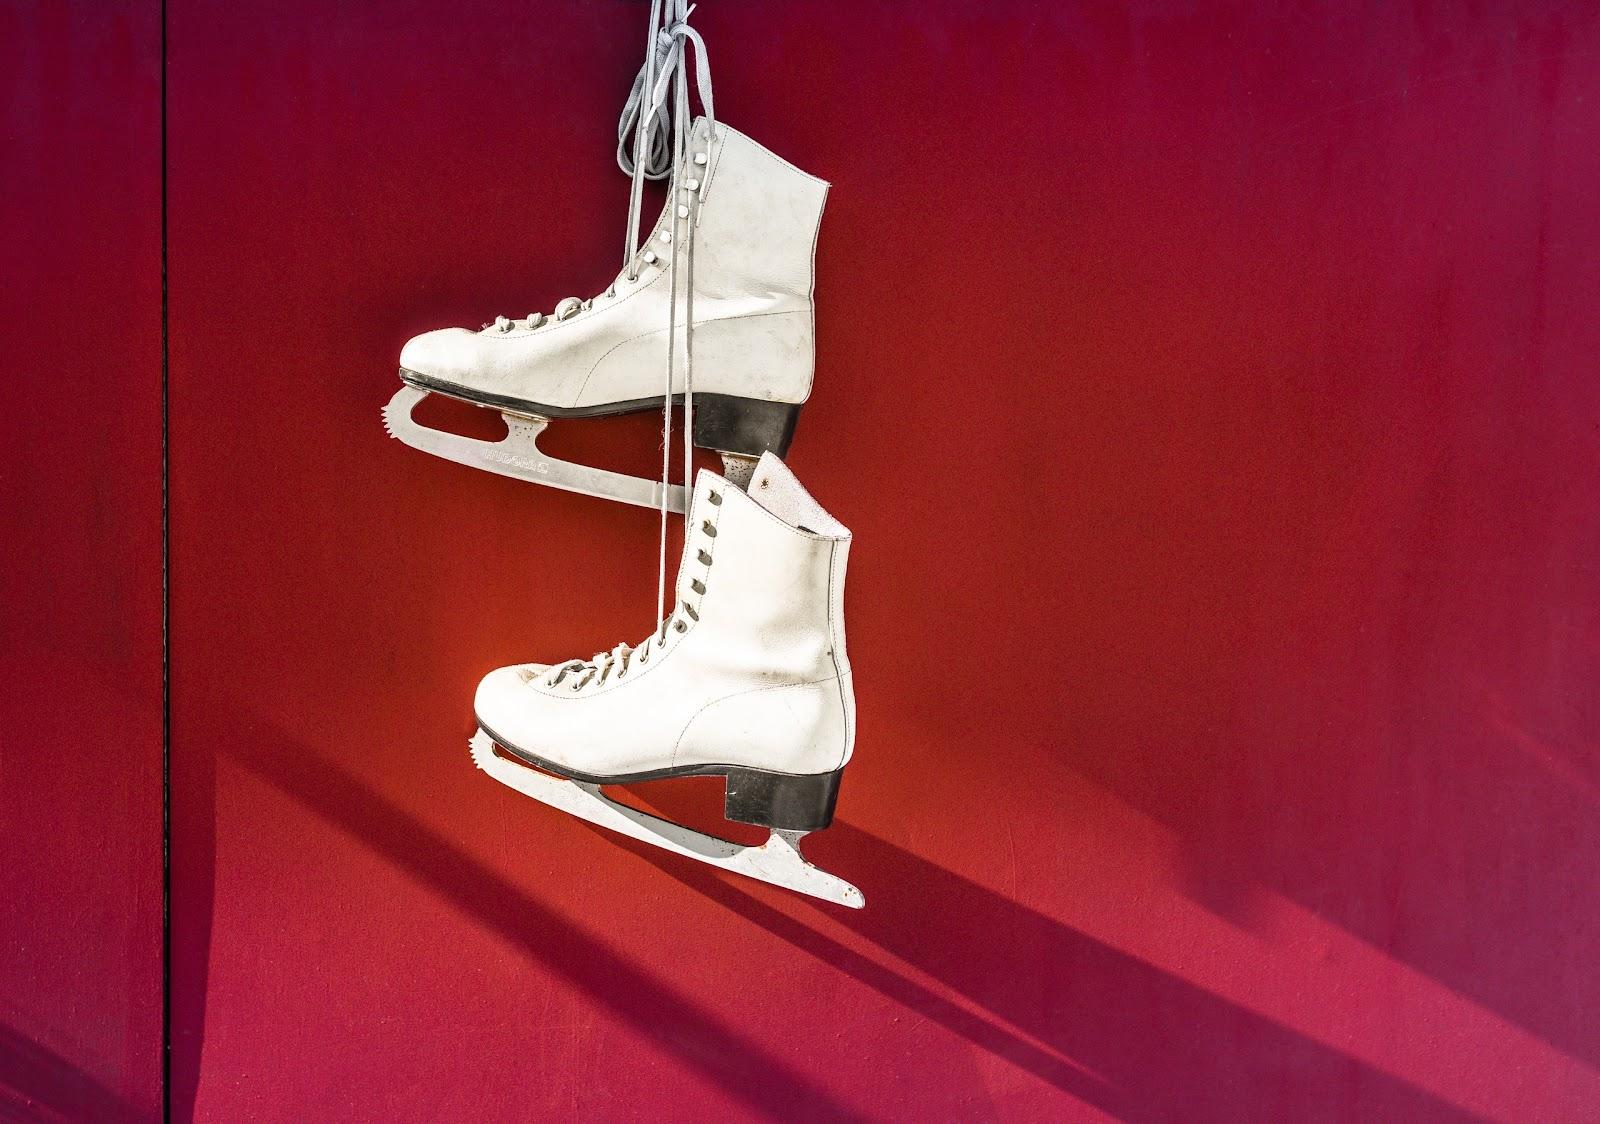 Ice Skating Skates - Quiksilver